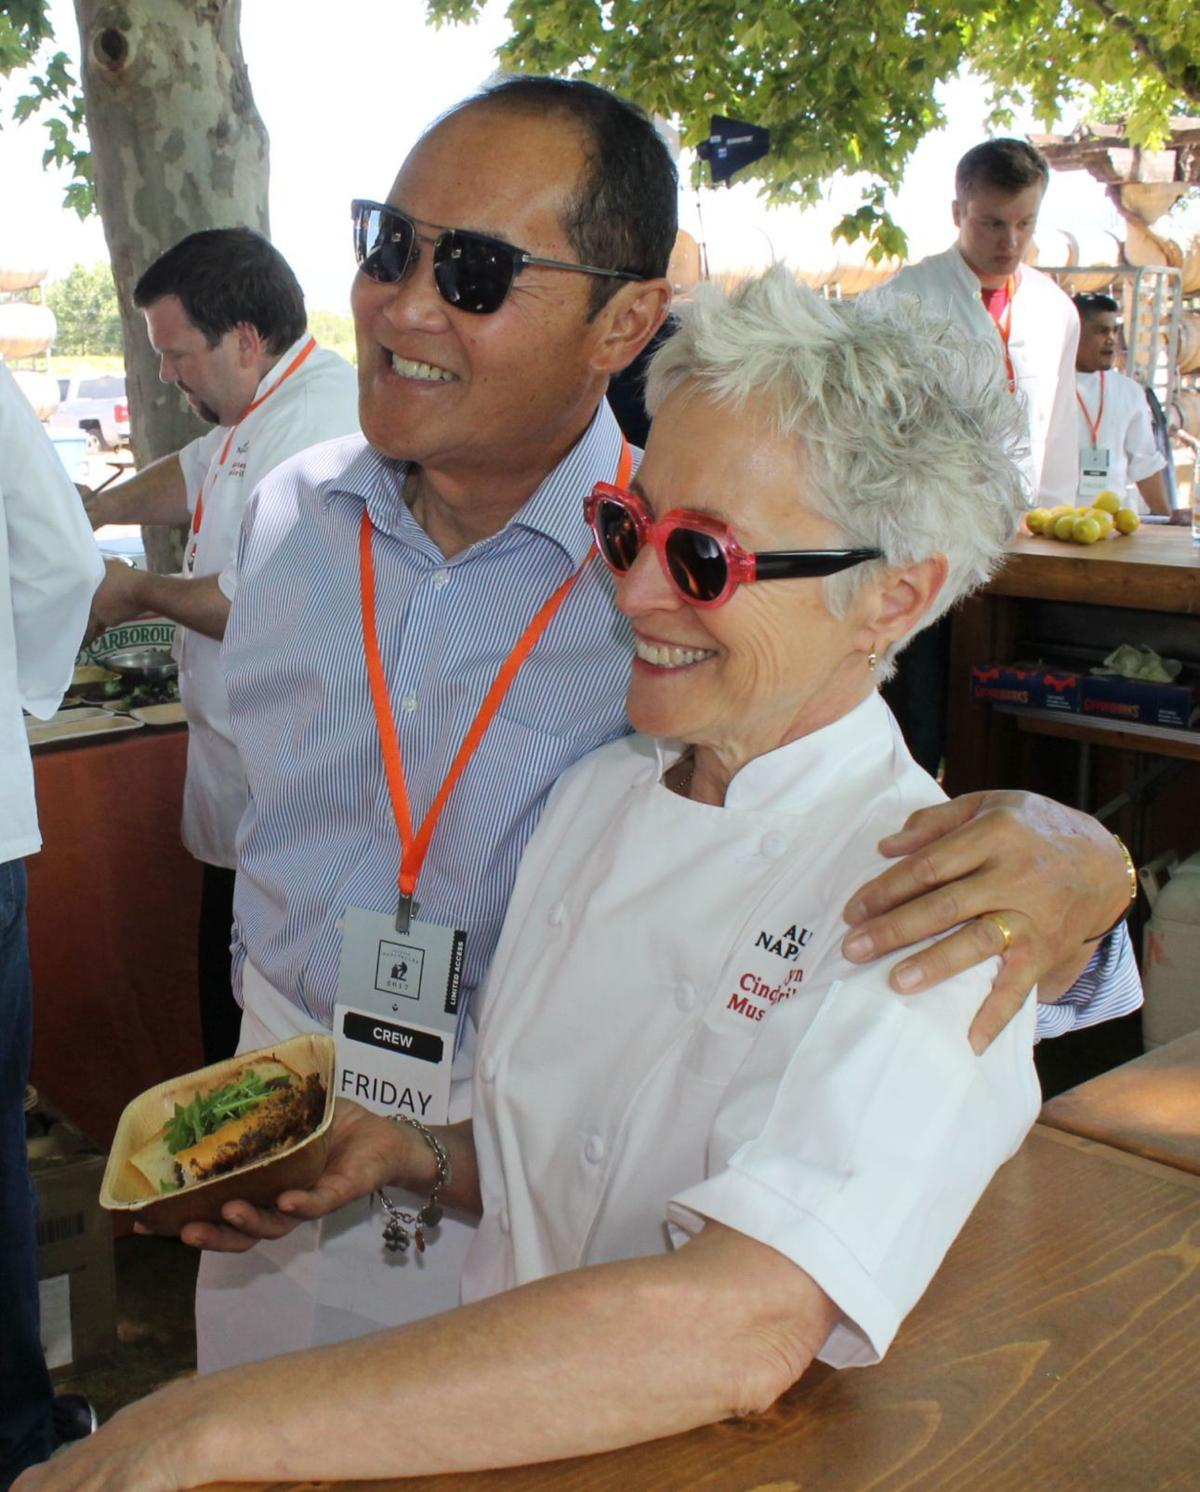 John Watanabe and Cindy Pawlcyn